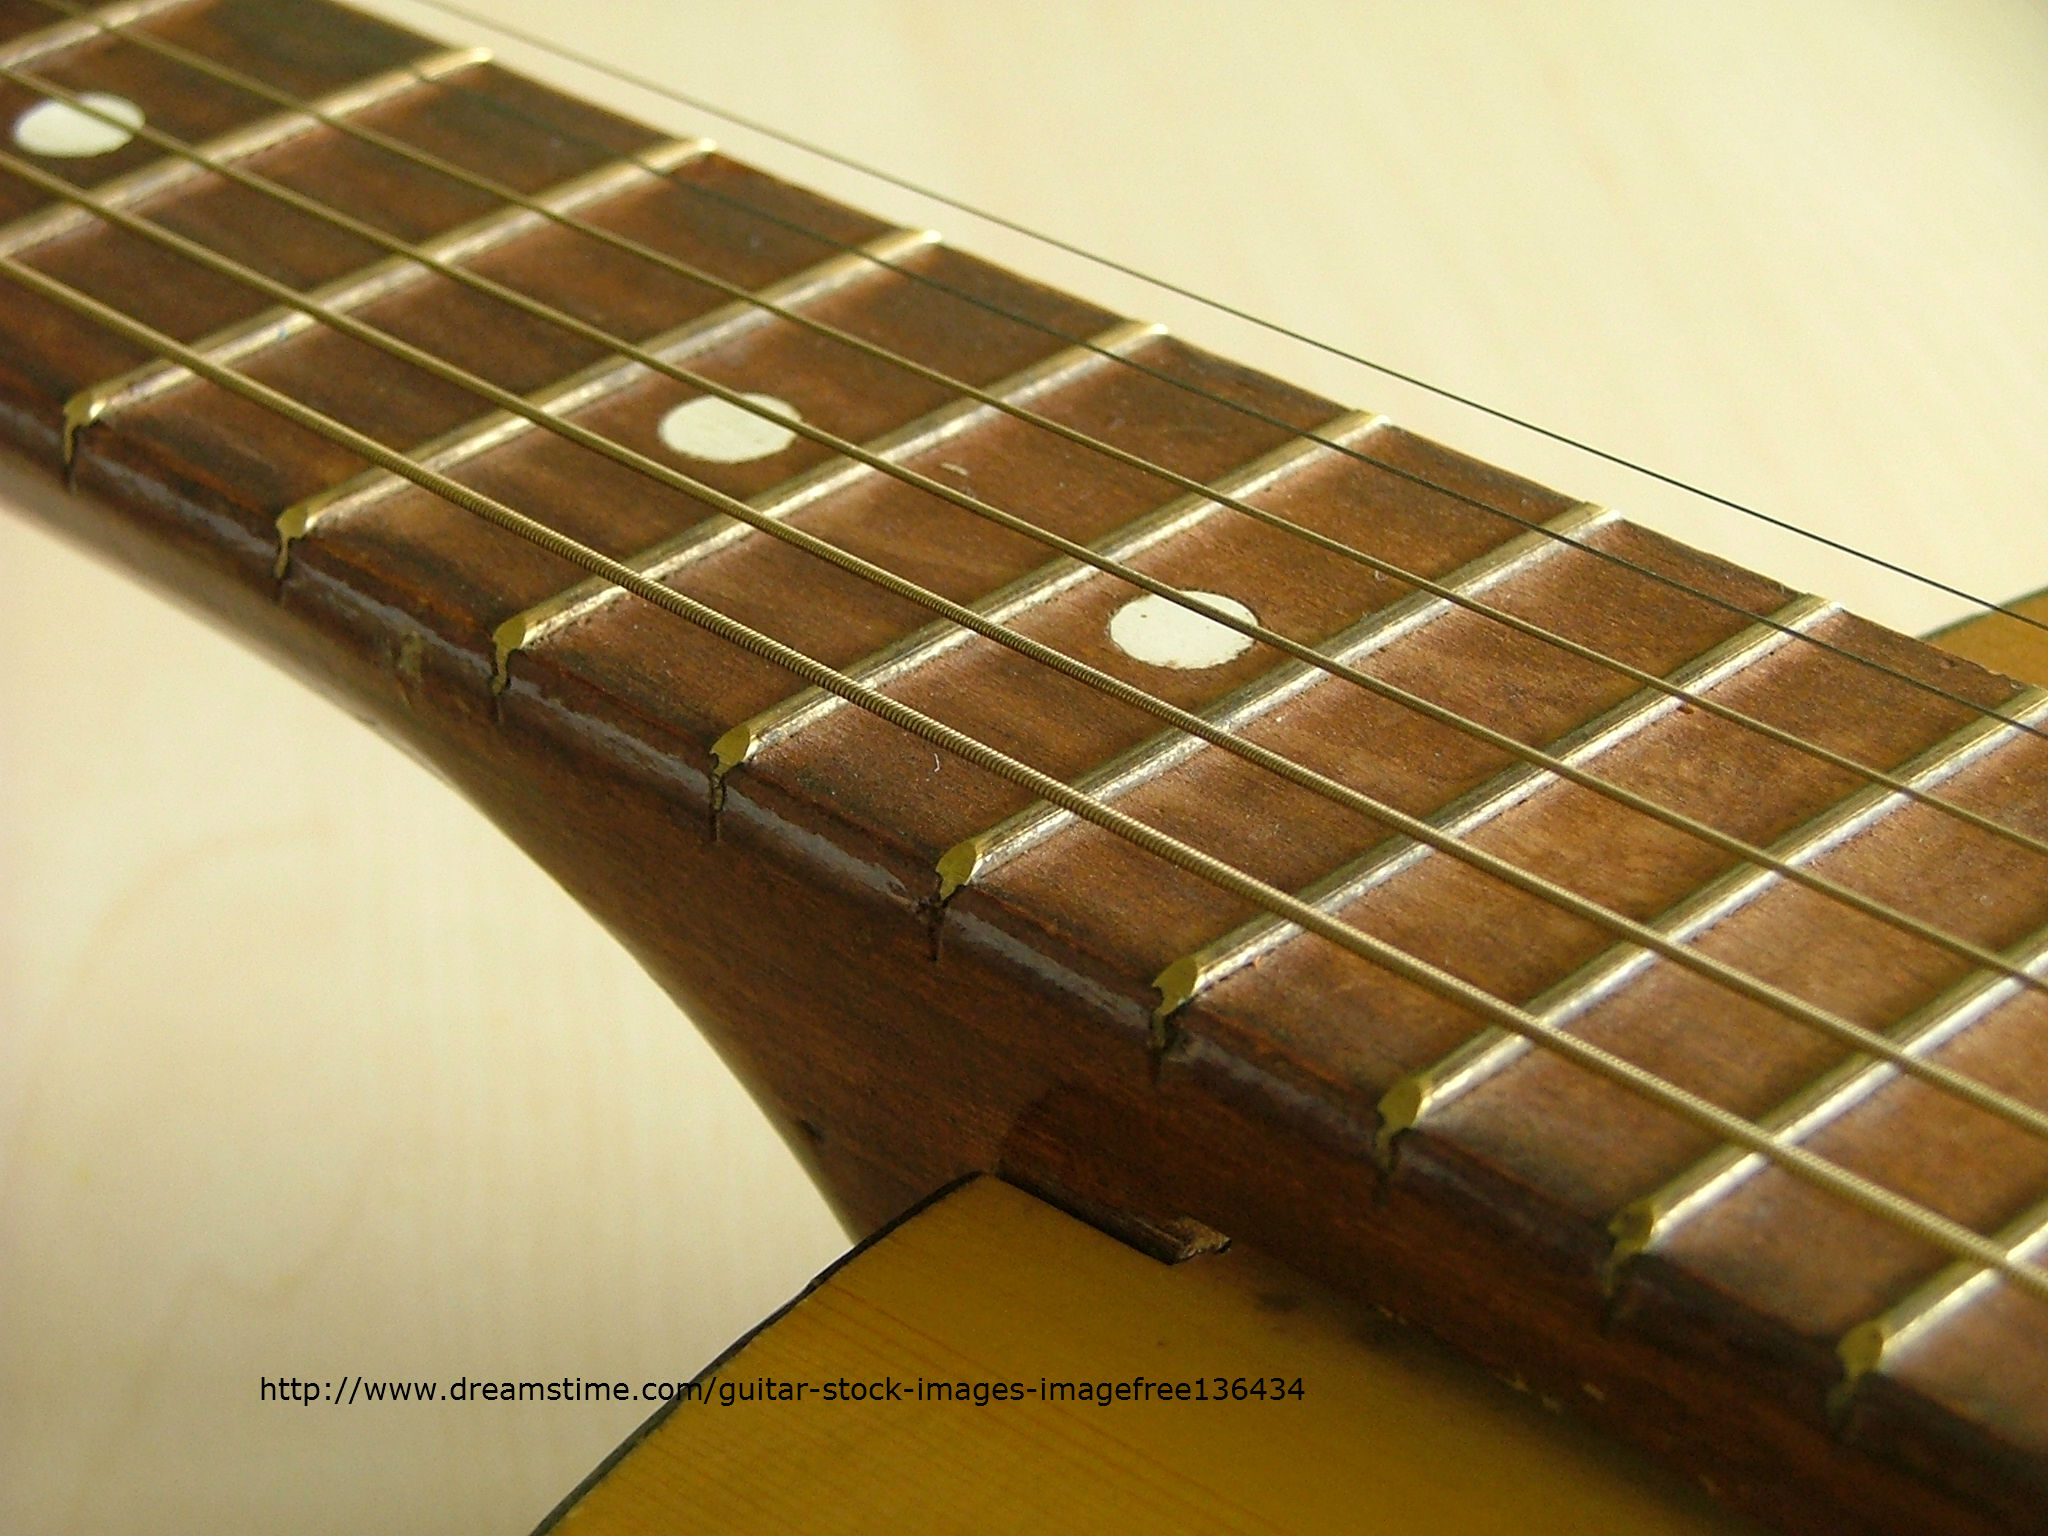 dreamstimefree_136434_guitar_300x300